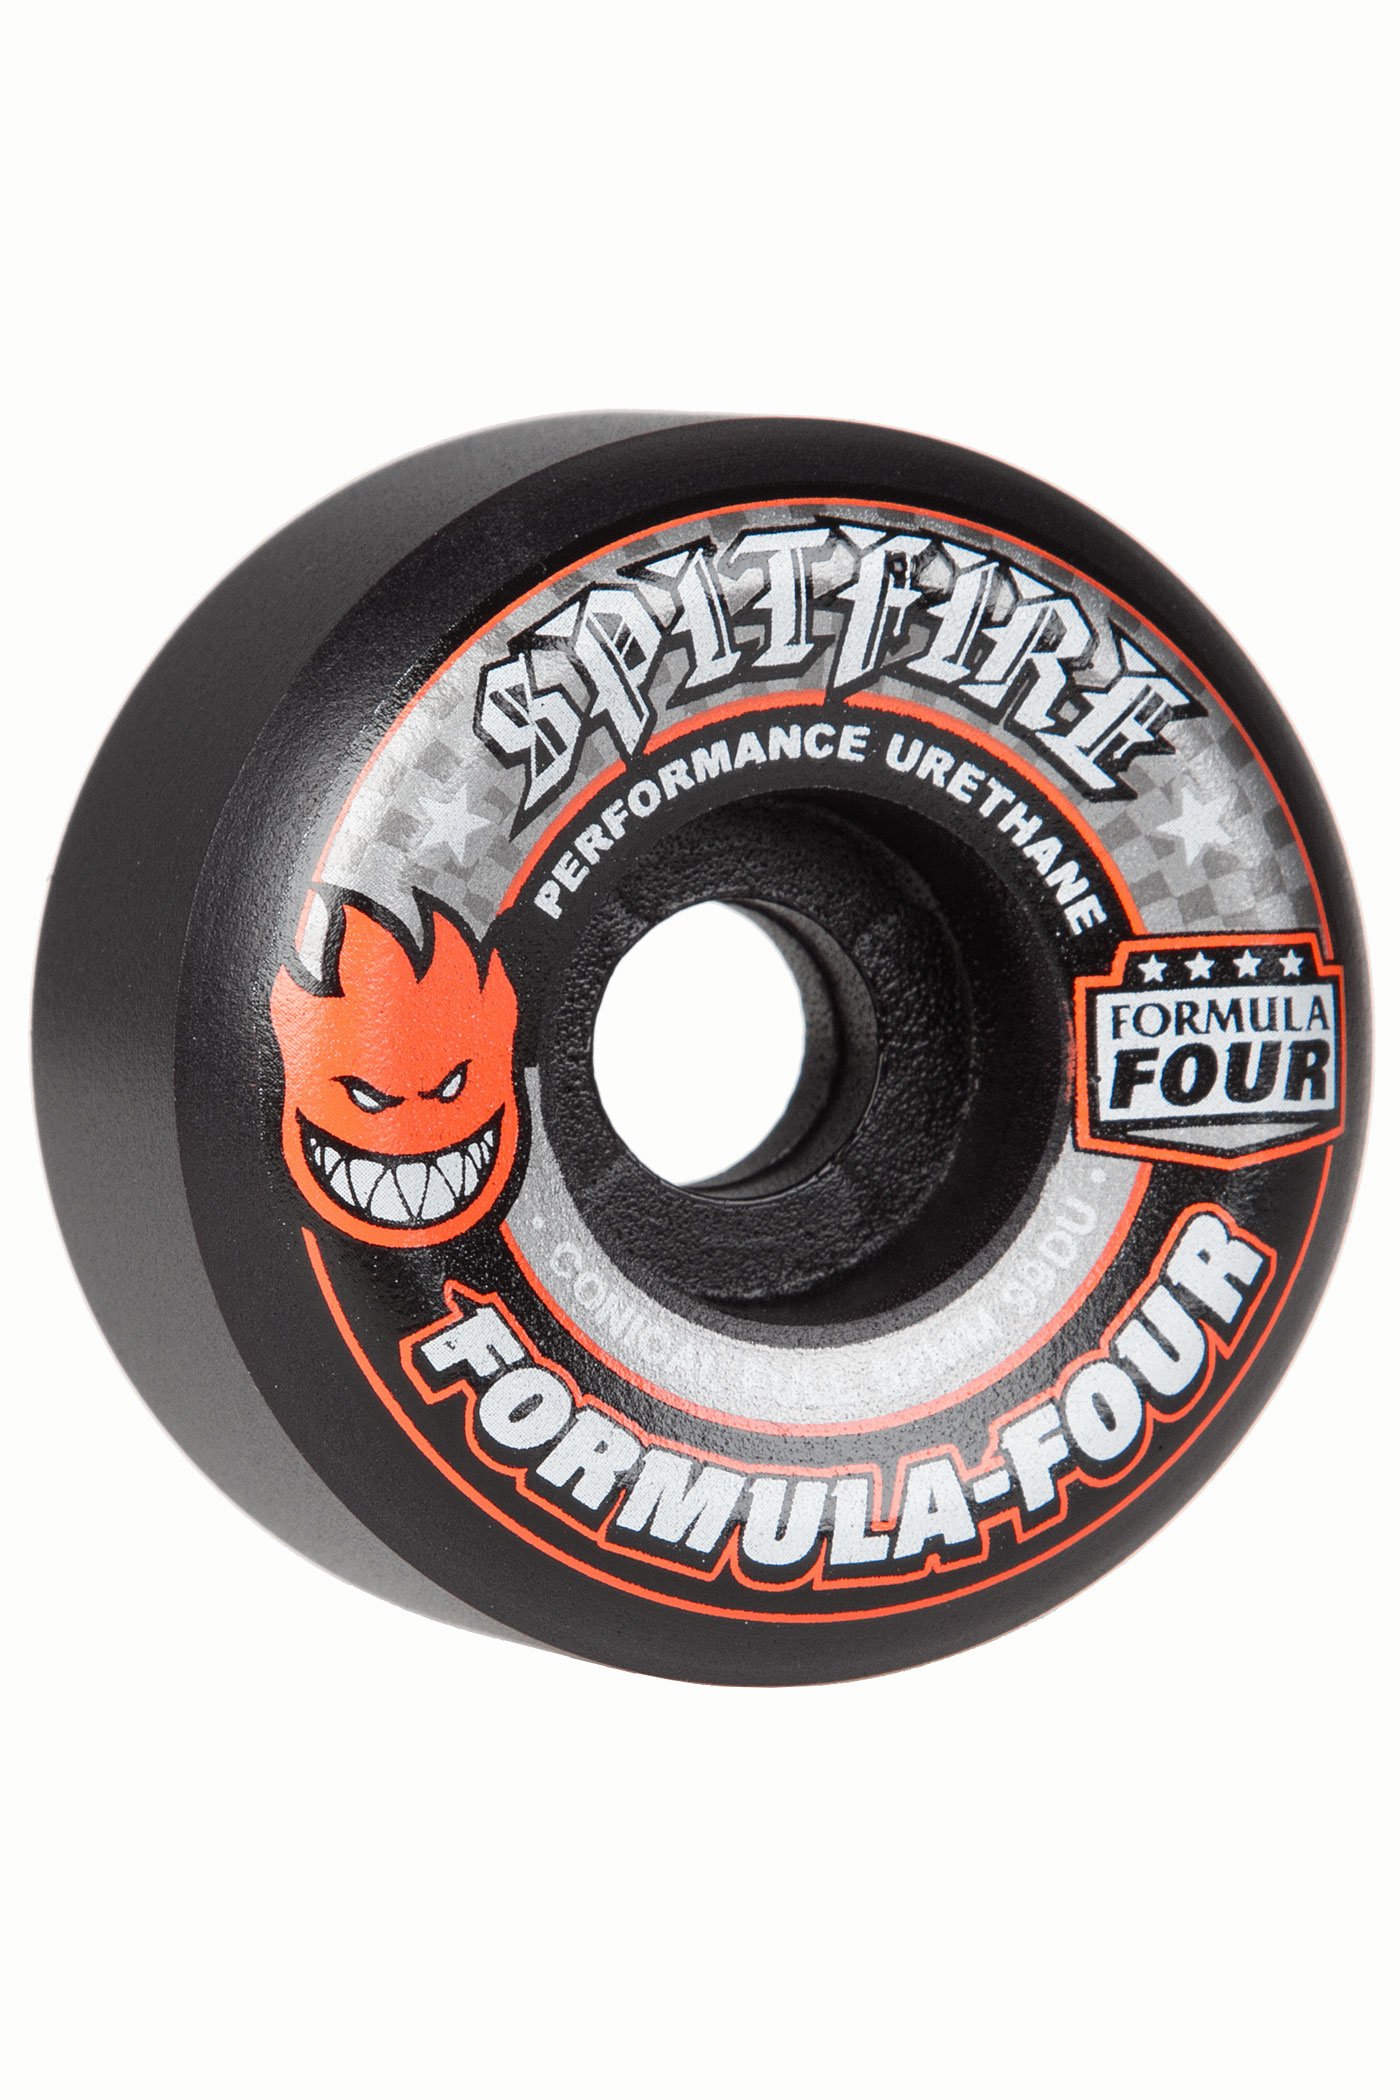 Spitfire Formula Four Conical Full 101D Skateboard Wheels ...